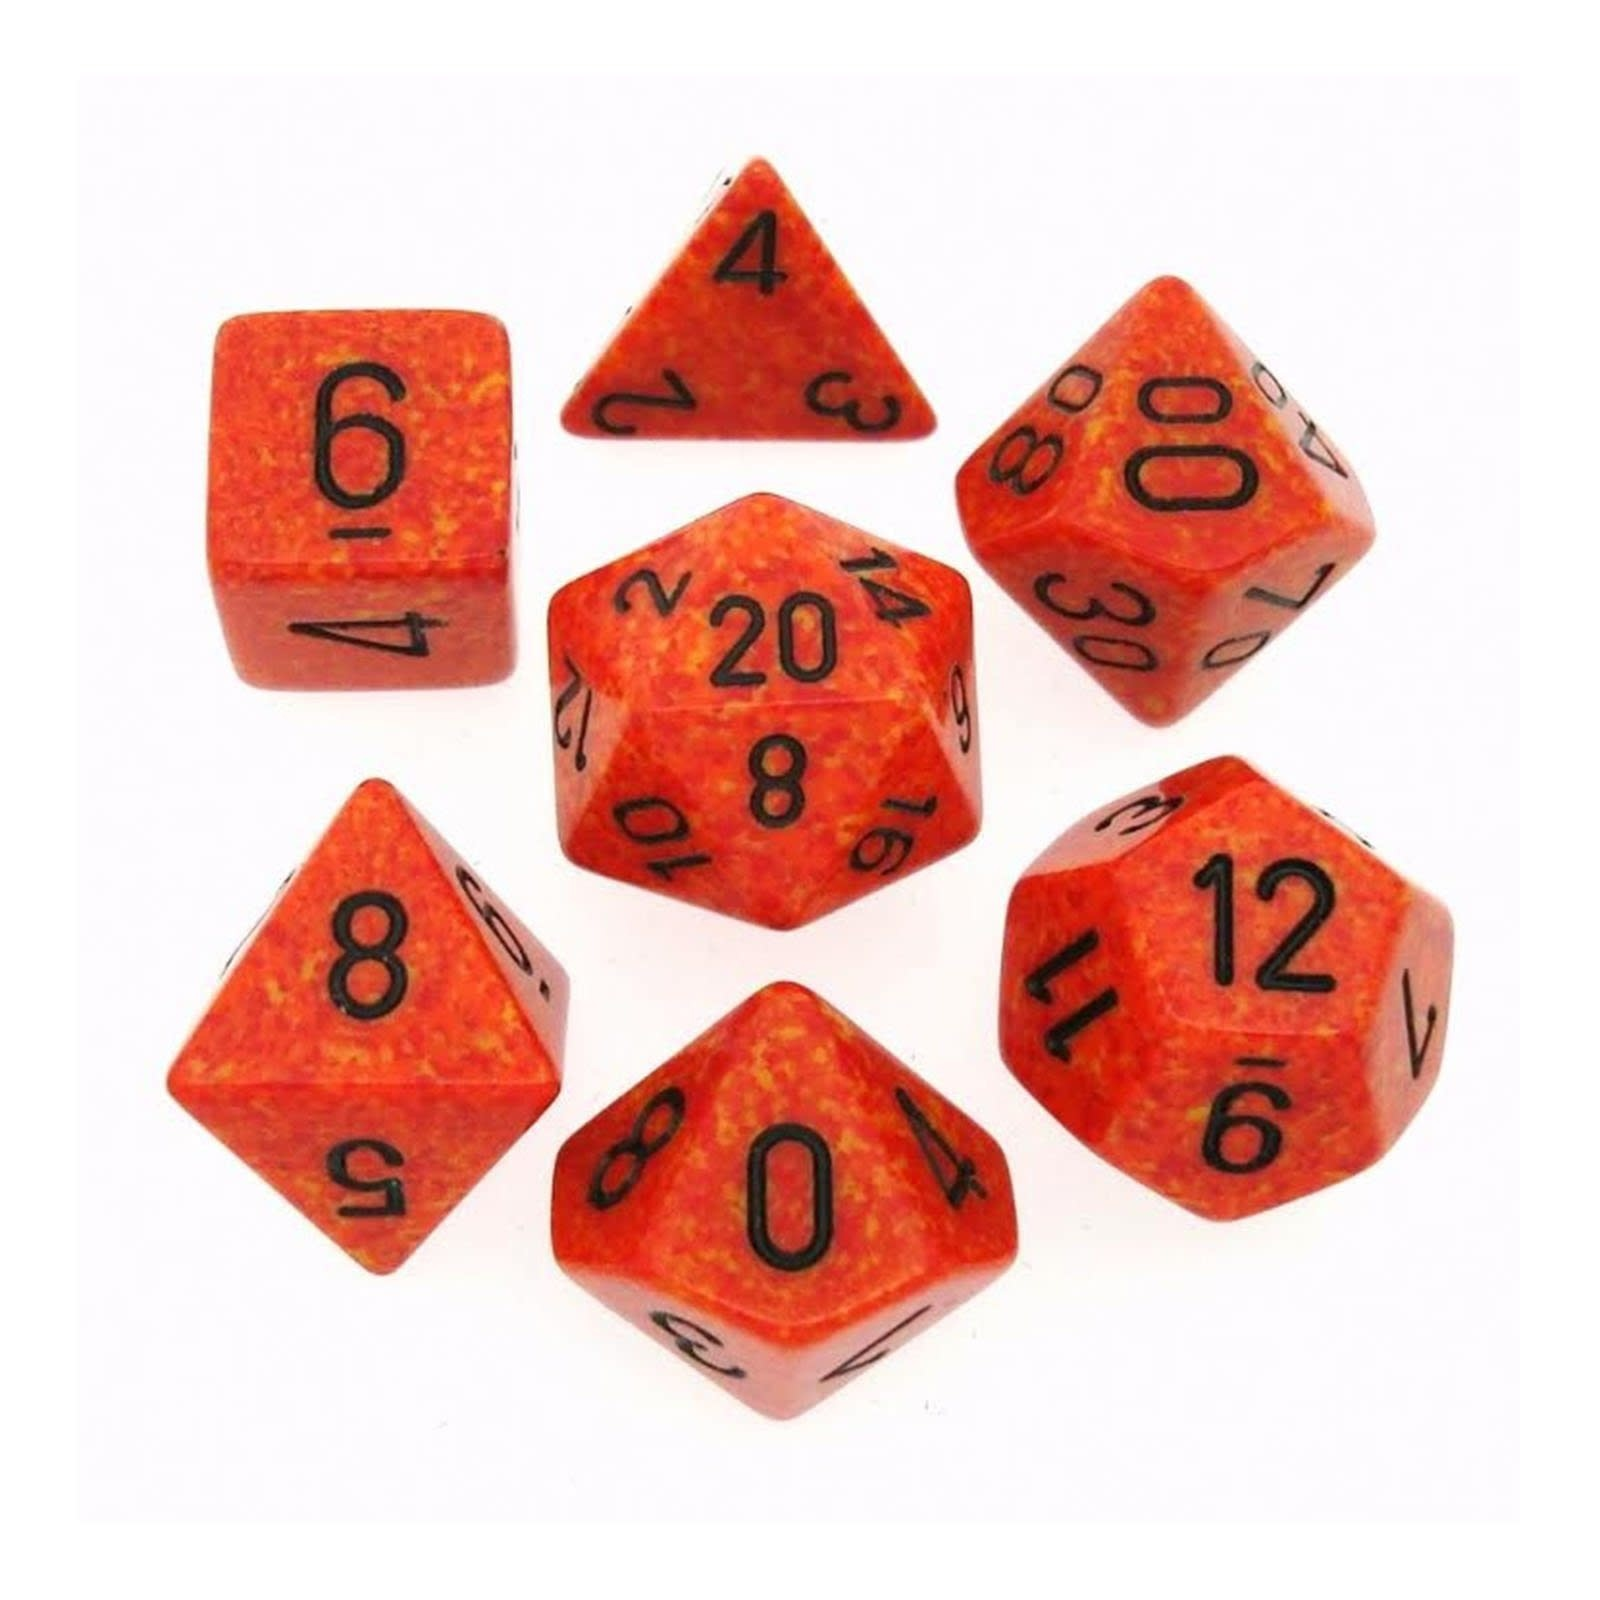 Chessex 7-Die Set Speckled Fire